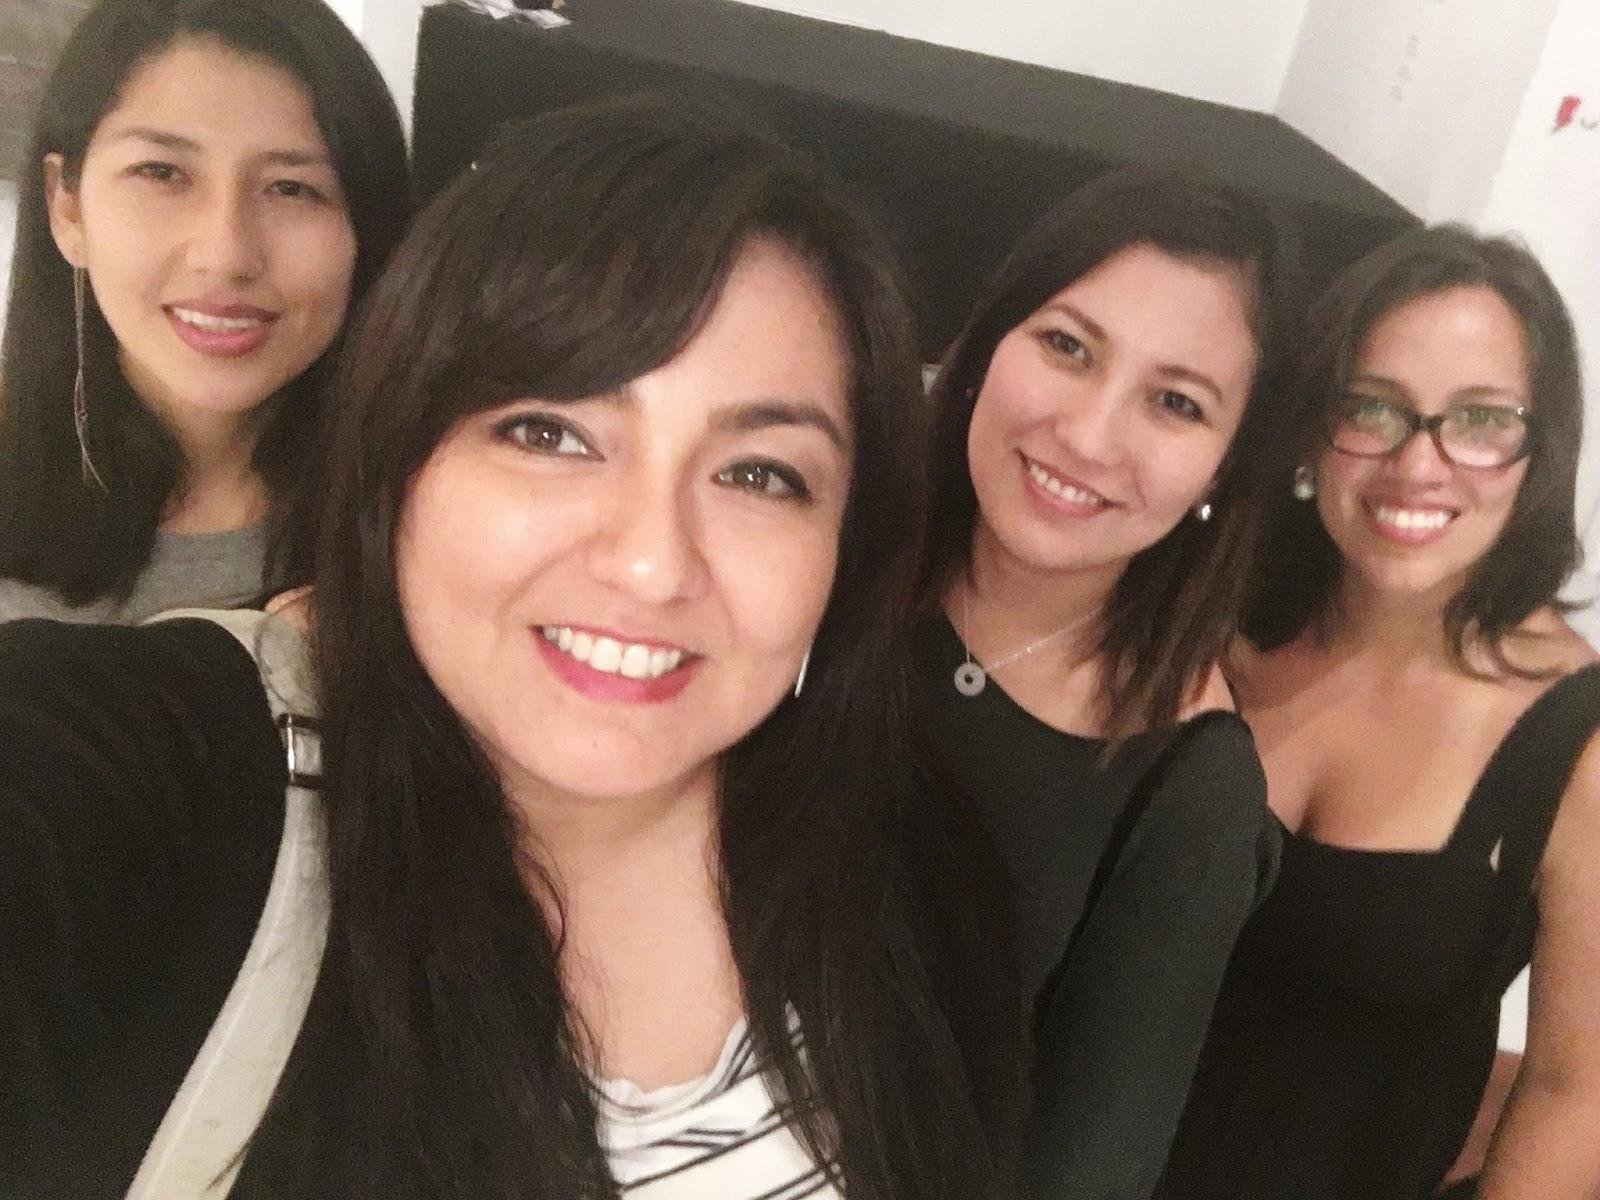 Bloggers, Legalmente en taco 12, Ropero Trapero, My Style Files Perú Ana Sofía Casaverde Selfie